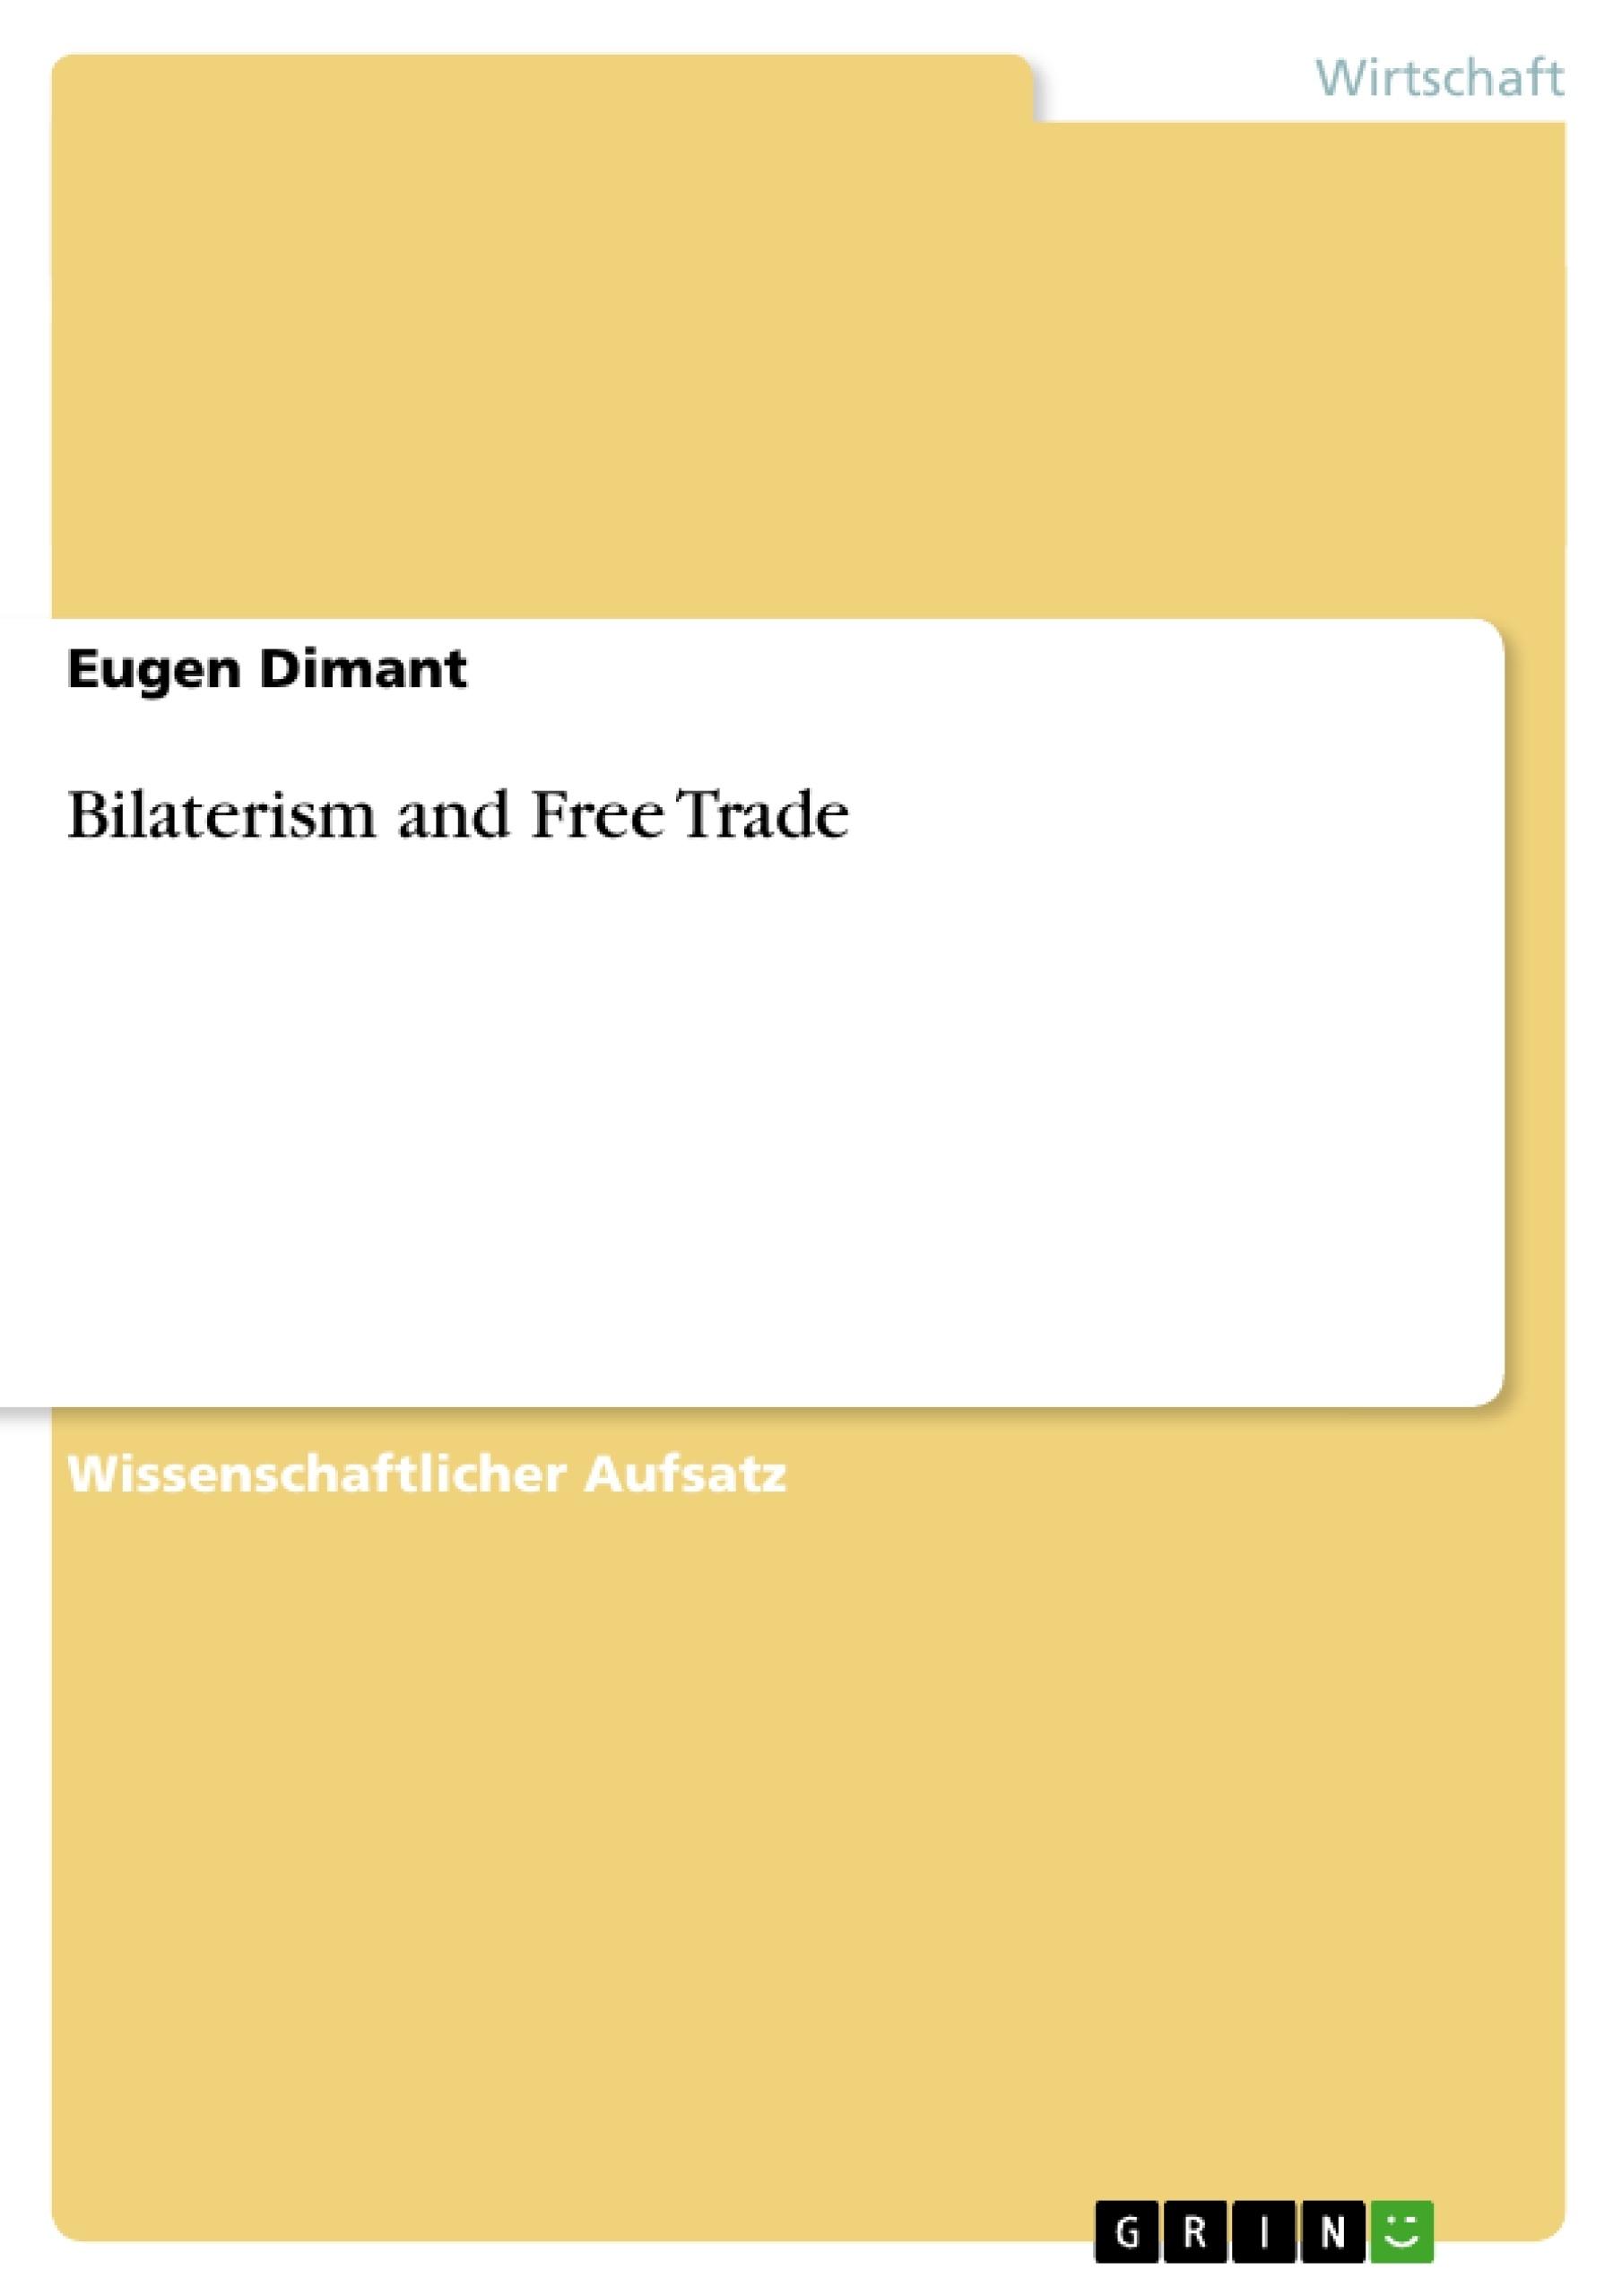 Titel: Bilaterism and Free Trade